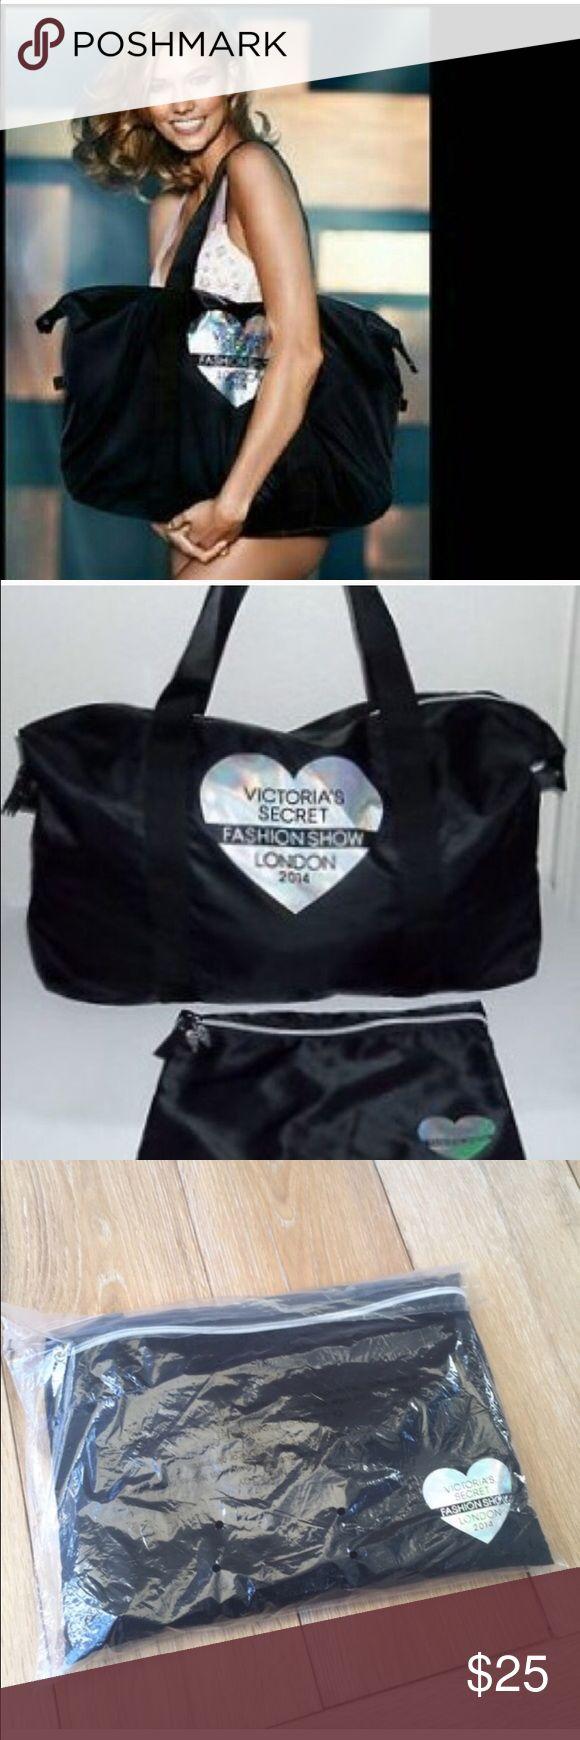 Victoria secret London fashion show 2014 2014 Victorias Secret London fashion show tote/bag. Brand new. Still in plastic. 100% nylon. Retail. $85! Victoria's Secret Bags Totes